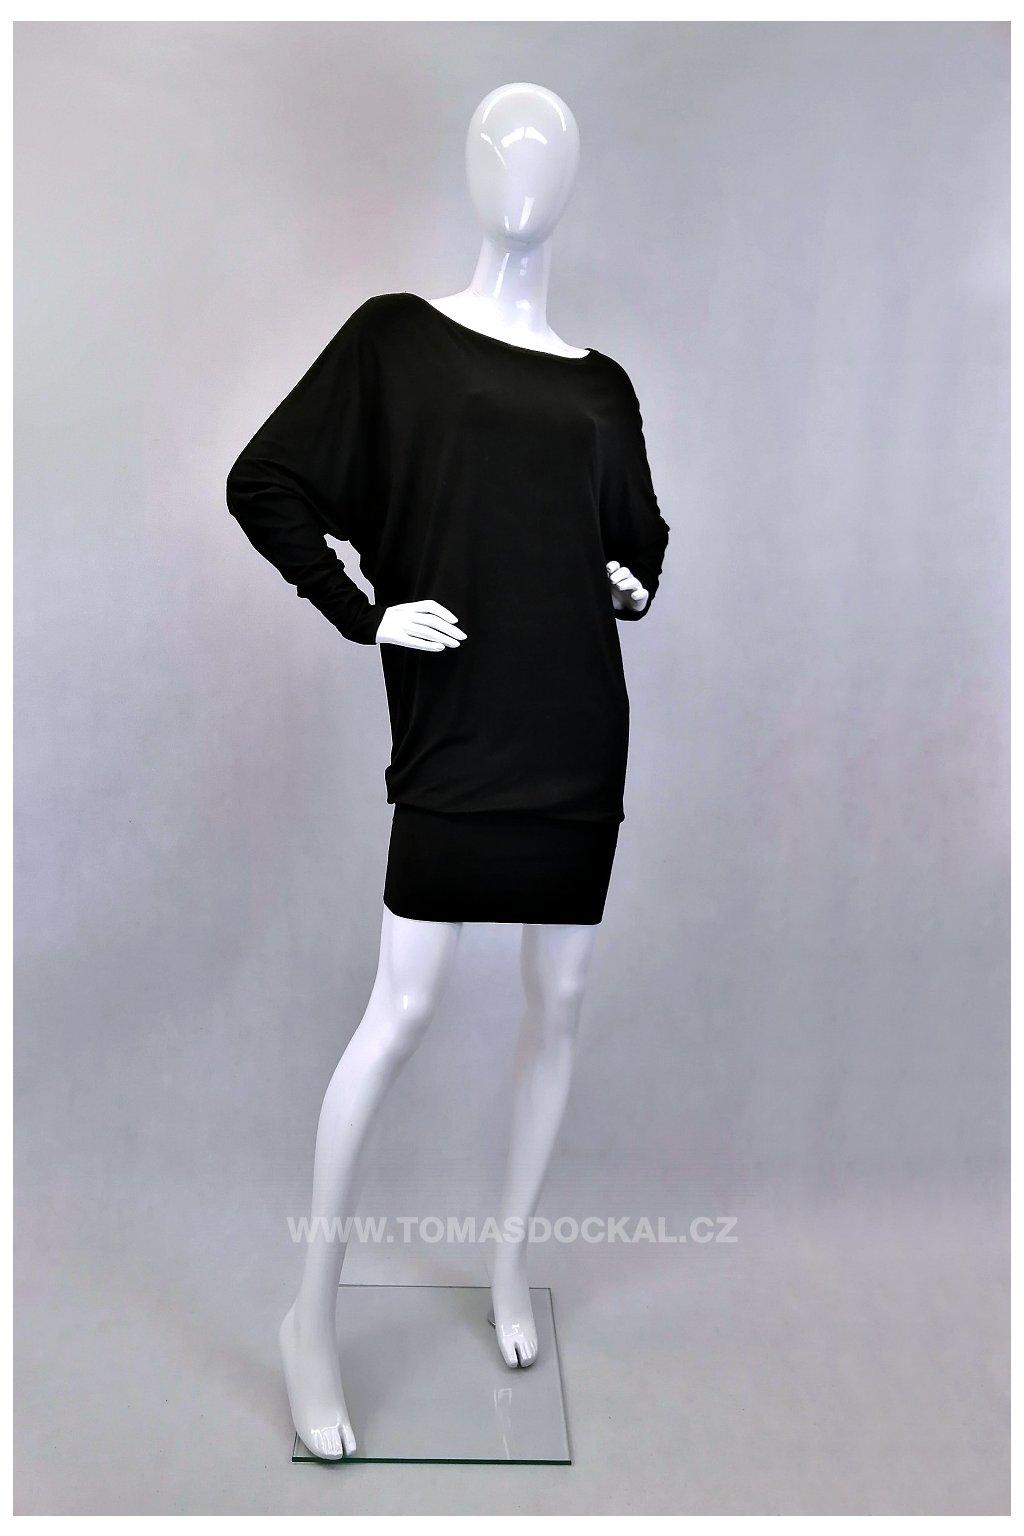 Šaty a tričko v jednom! UNI / černé